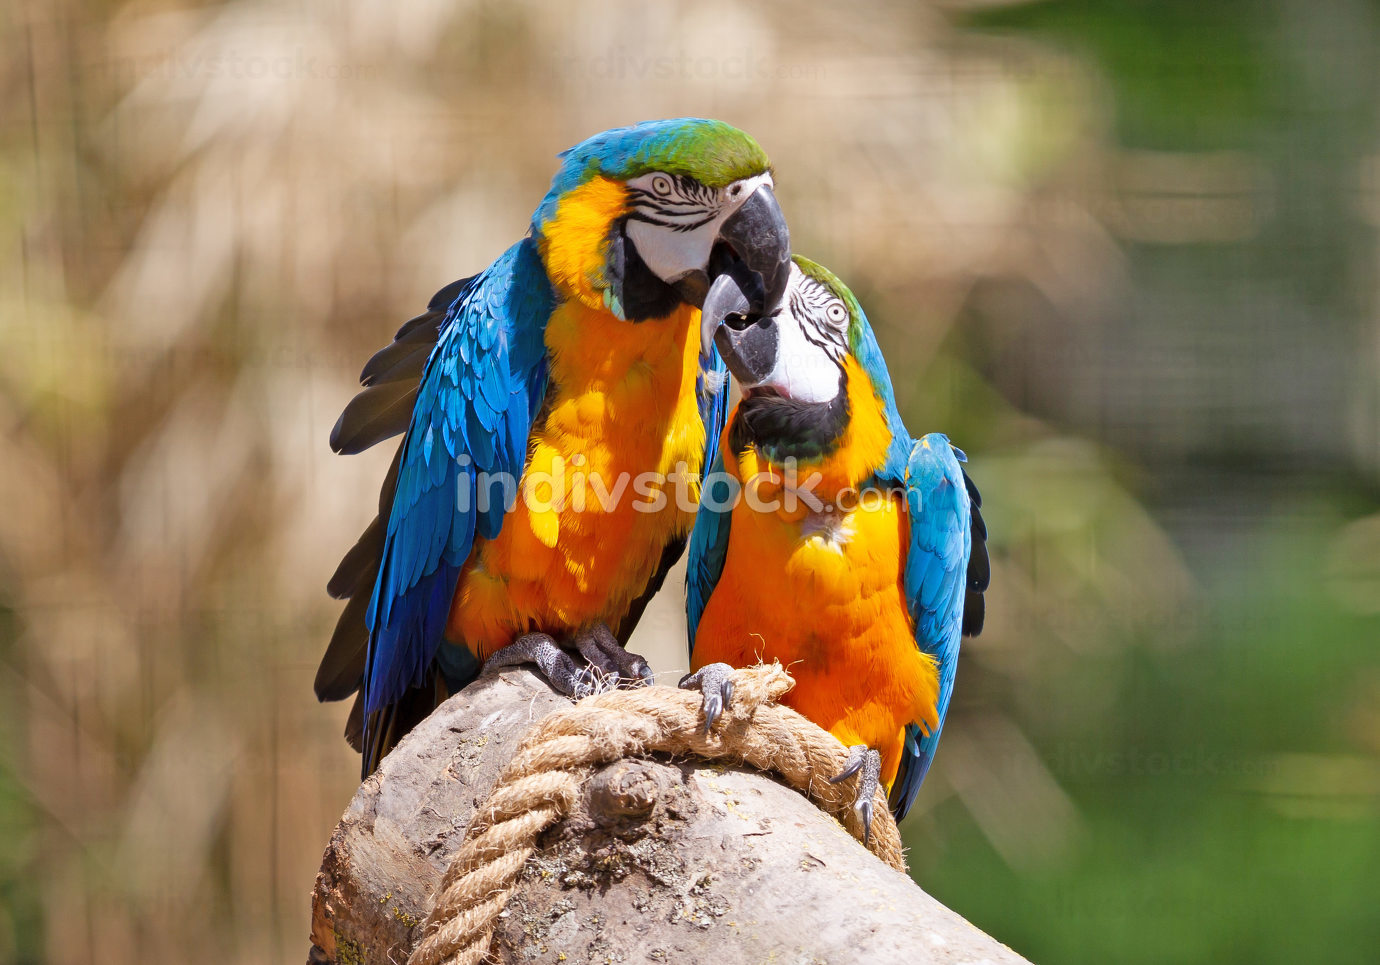 Couple of parrots kissing